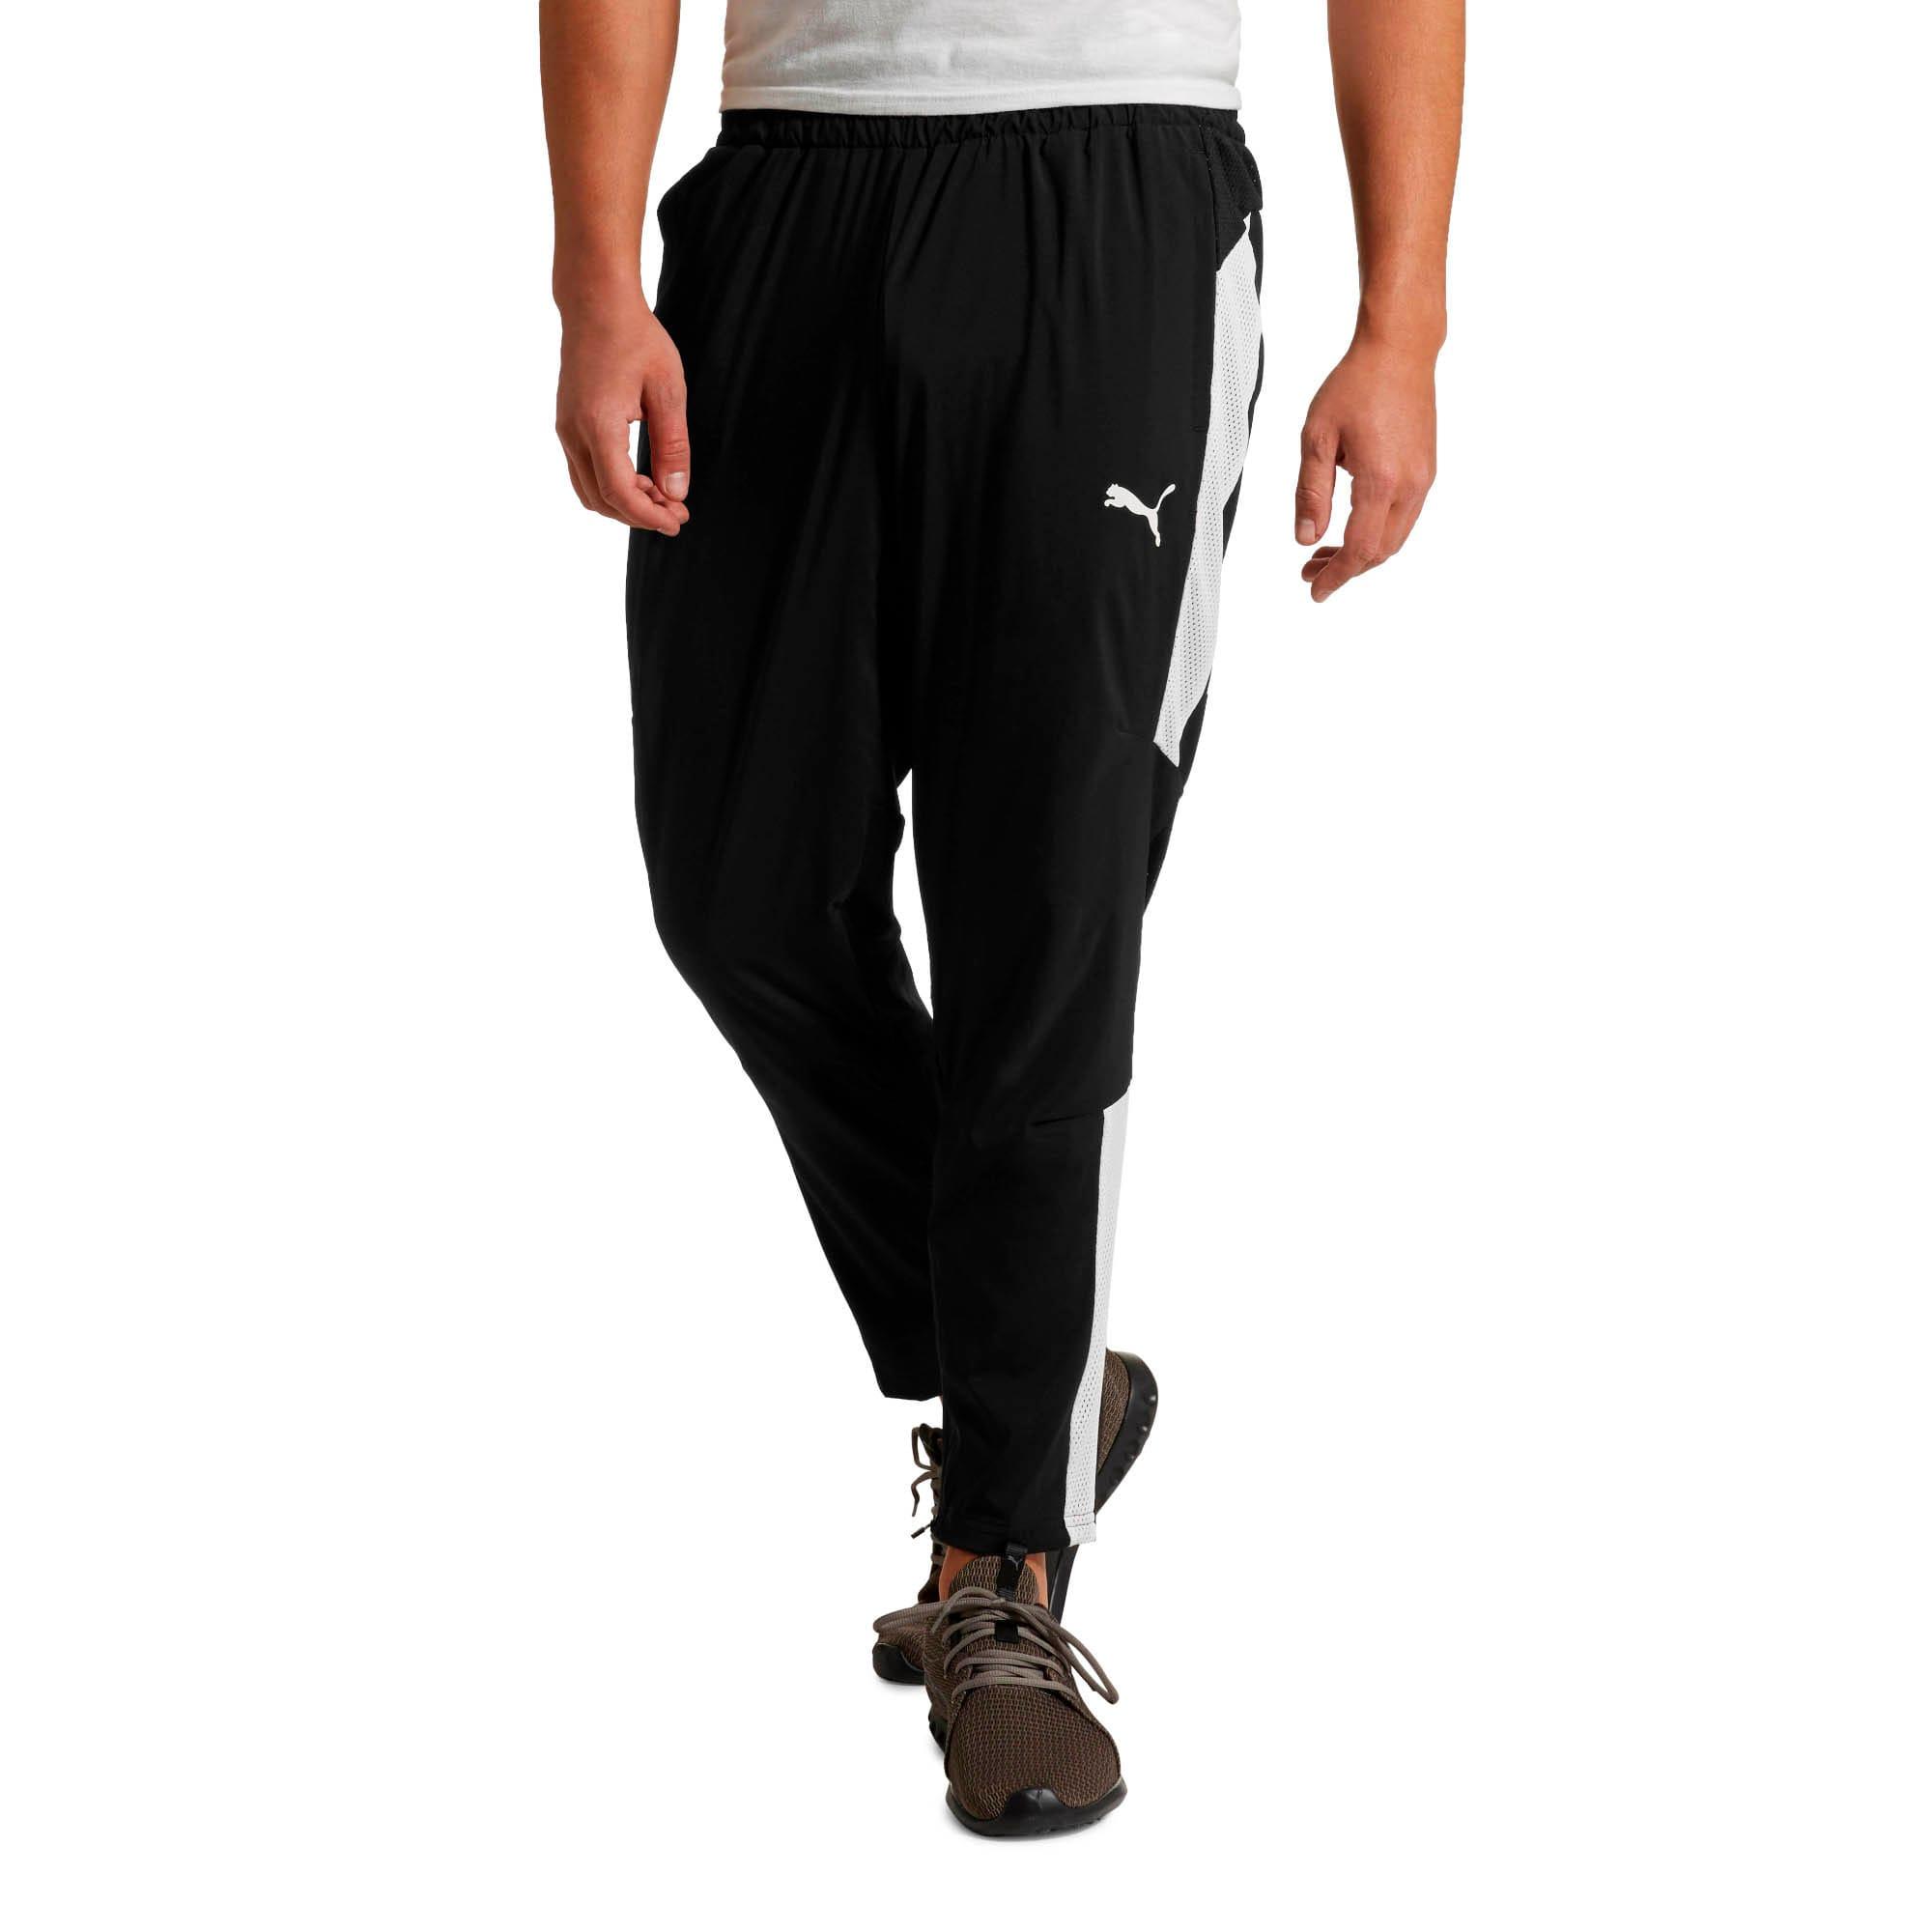 Thumbnail 1 of Energy Blaster Men's Woven Pants, Puma Black-Puma White, medium